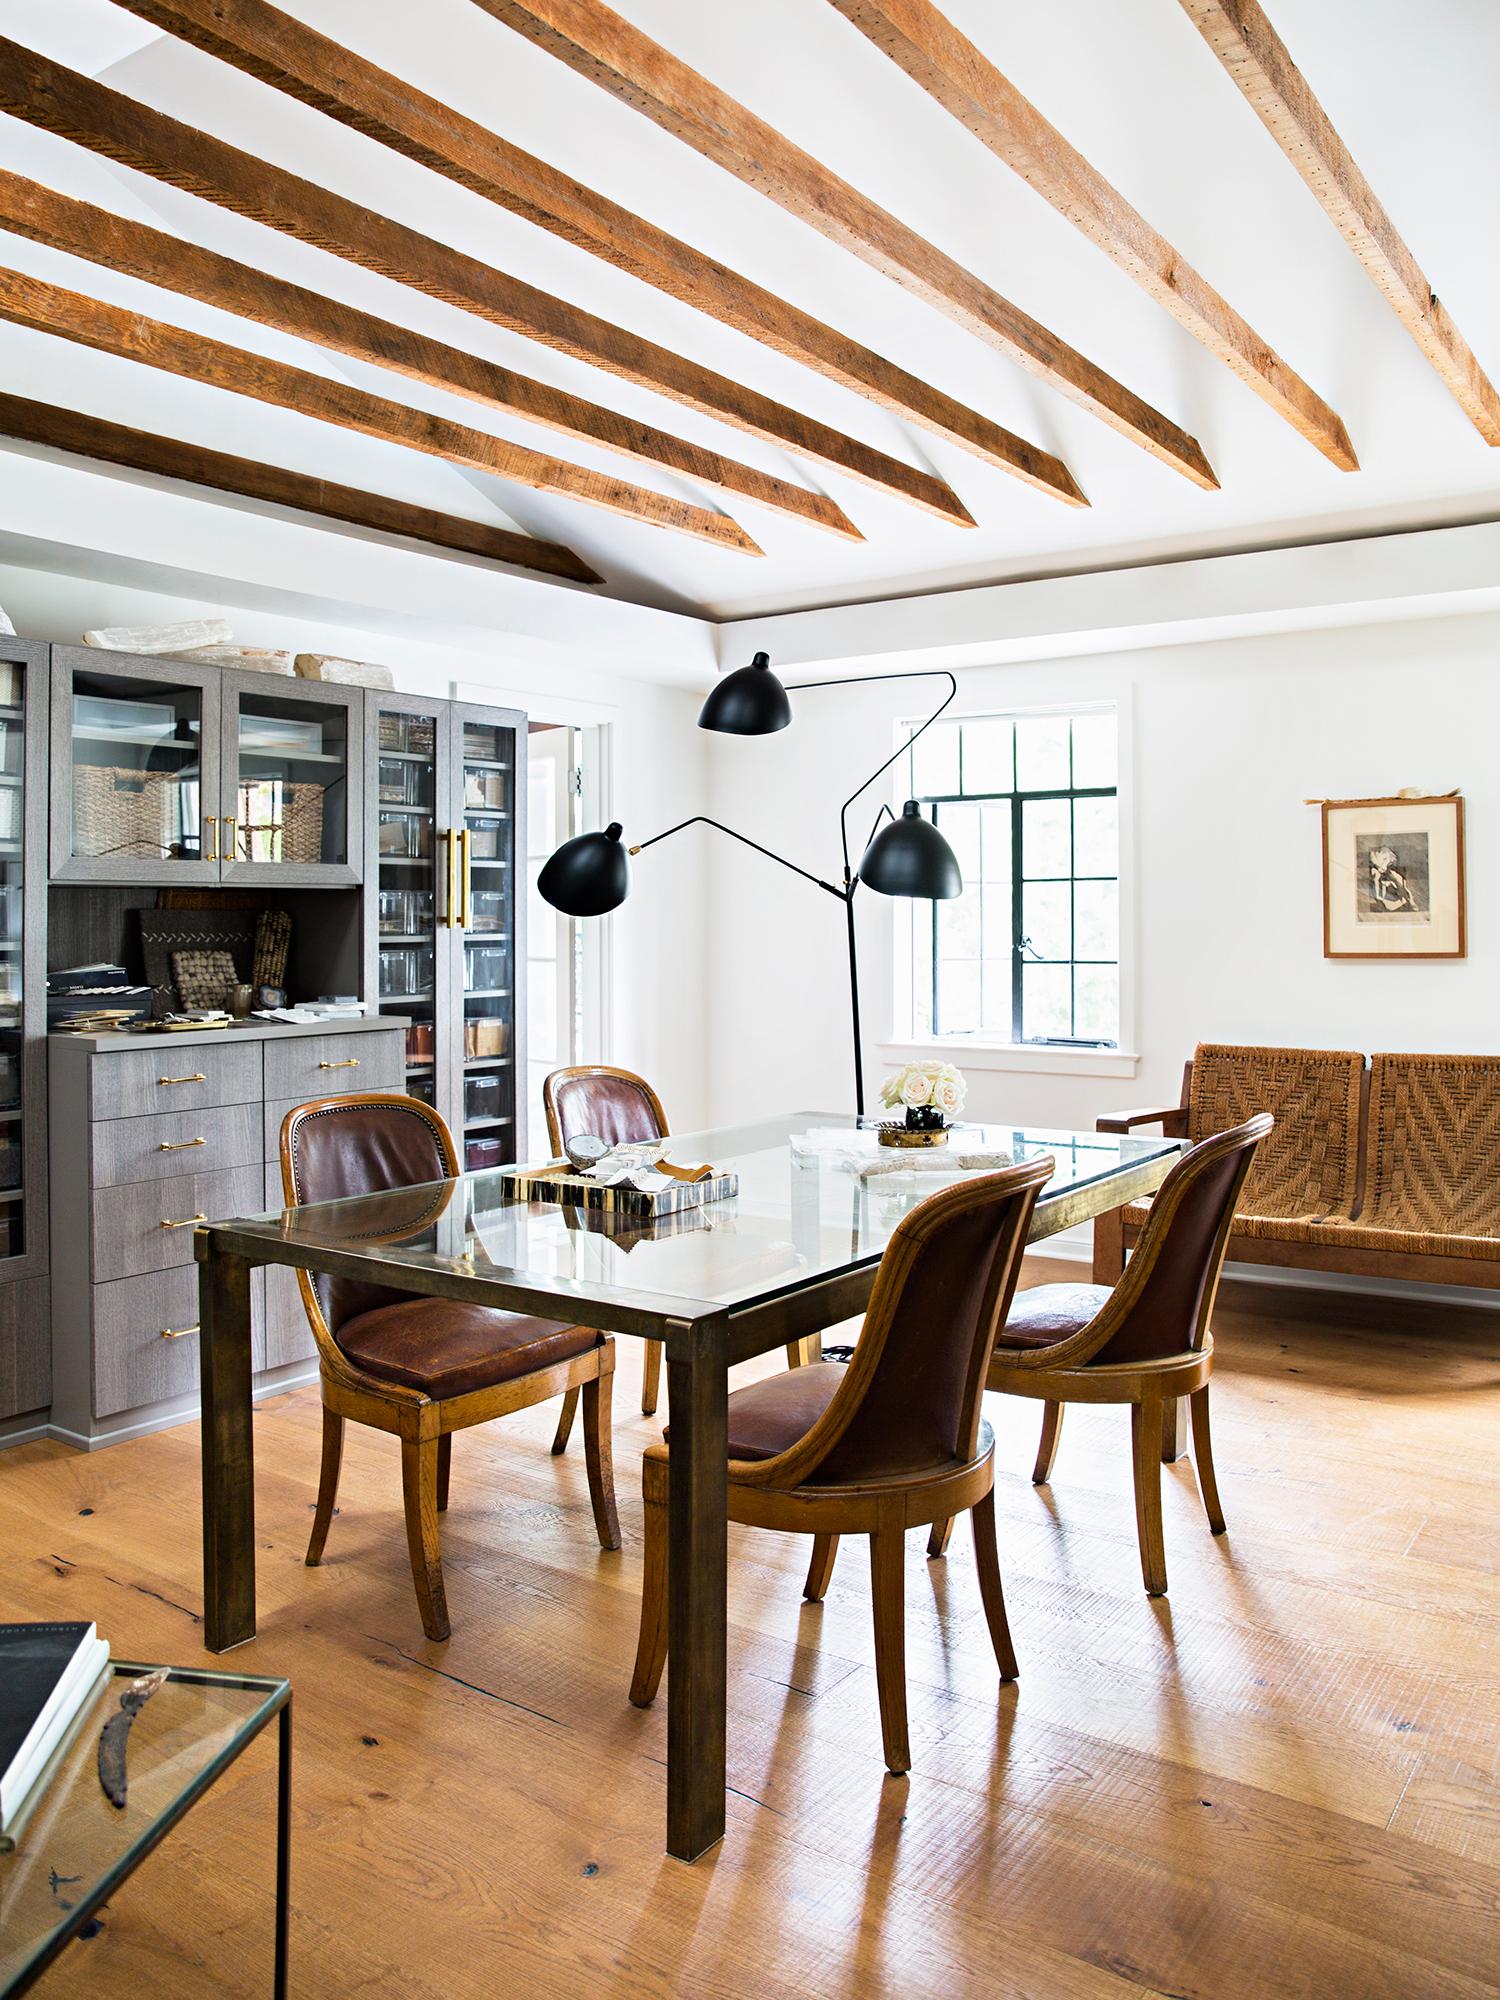 Interior Design by Jeremiah Brent | Elle Decor